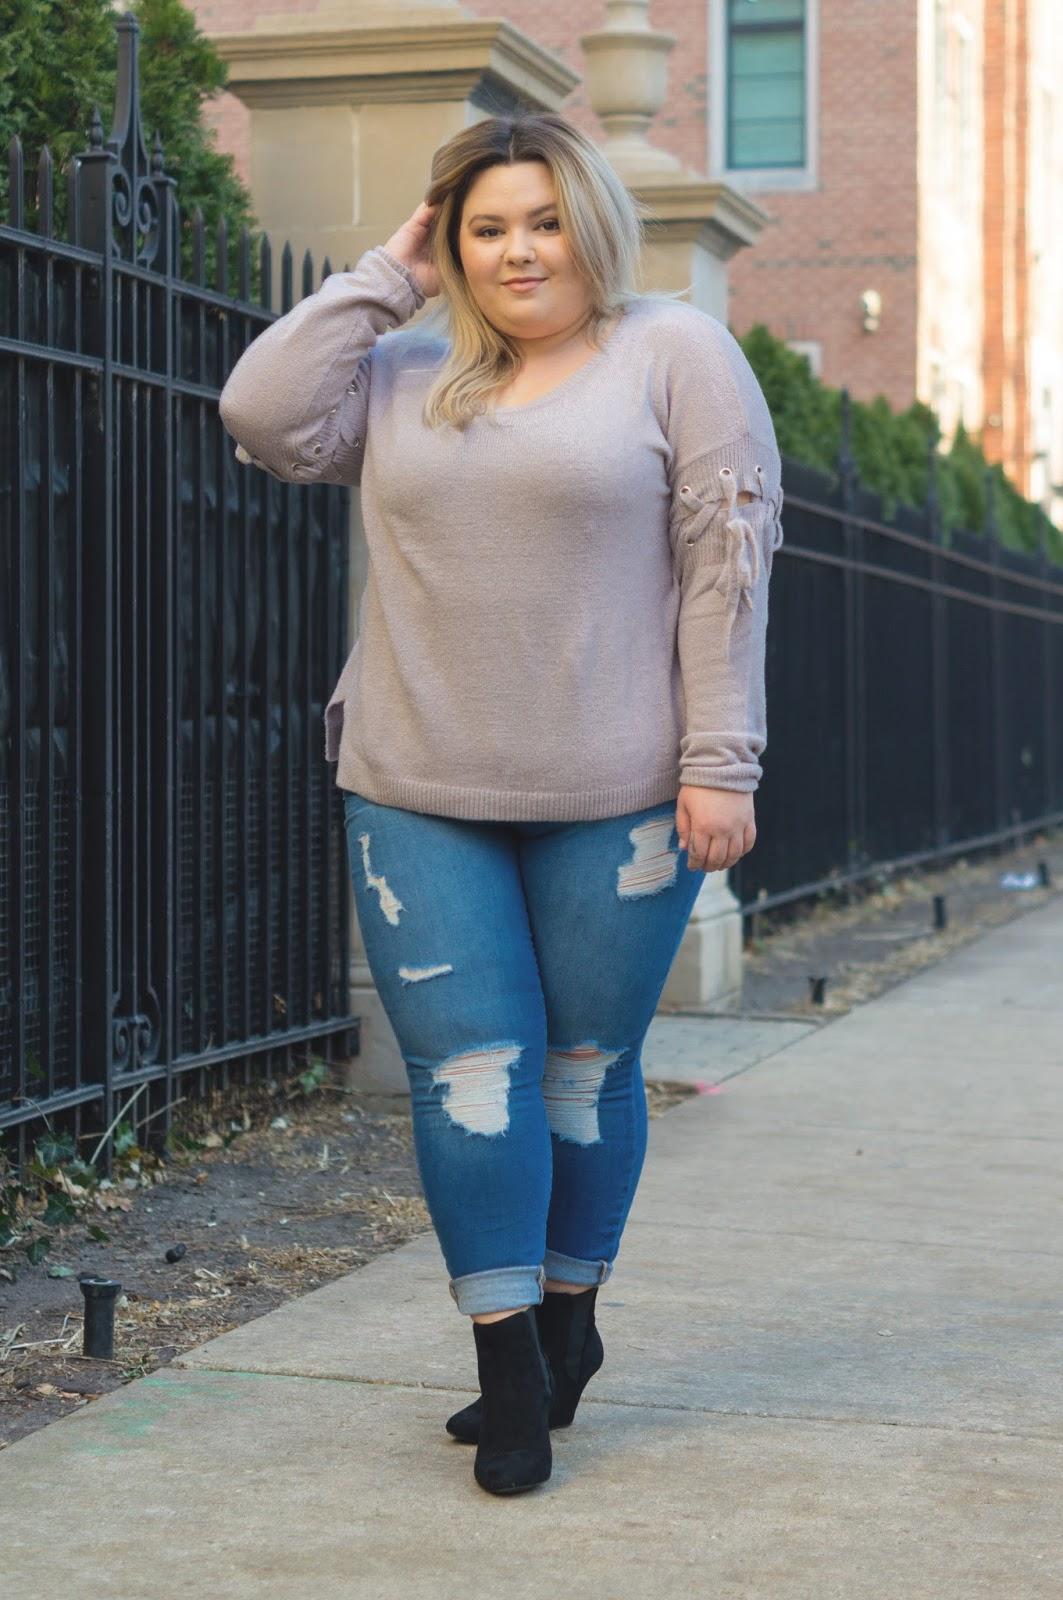 natalie craig, chicago fashion, chicago plus size fashion blogger, chicago model, plus size chicago model, affordable plus size fashion, eff your beauty standards, charlotte russe plus, plus size denim, tummy control panel, jeans with tummy control, embrace your curves, fatshion, body positive